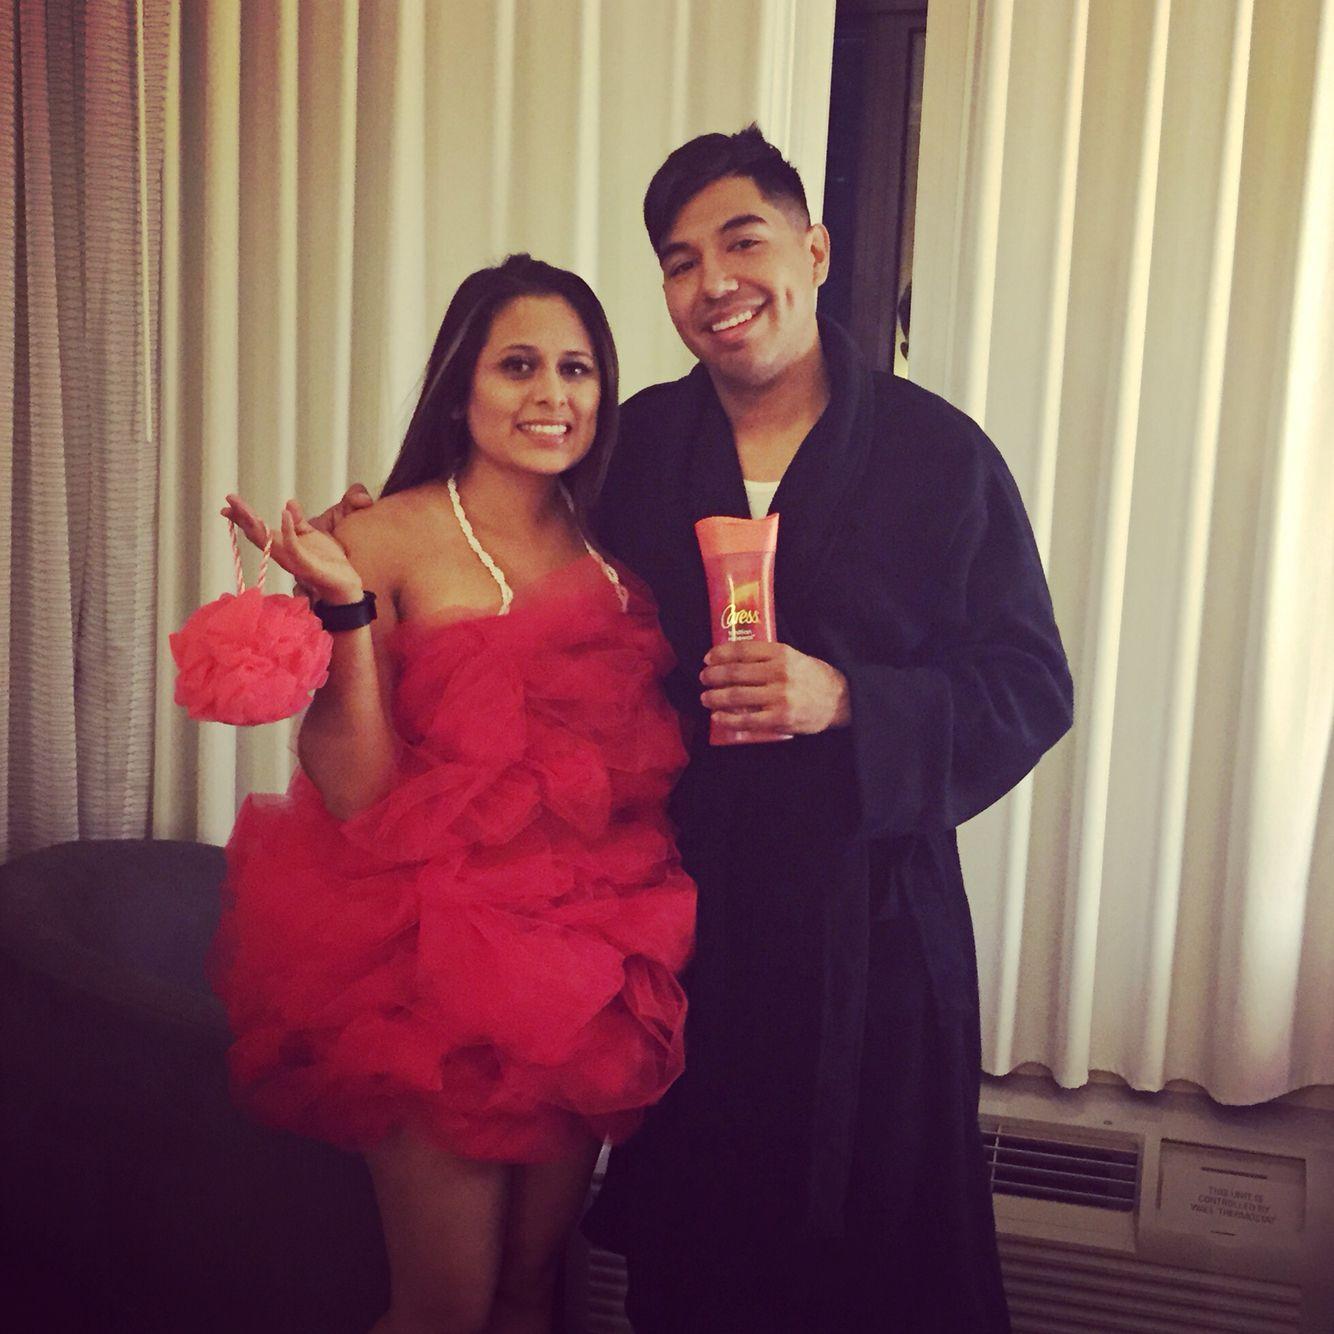 Loofah costume diy 2015 loofah costume pinterest loofah loofah costume diy 2015 solutioingenieria Gallery